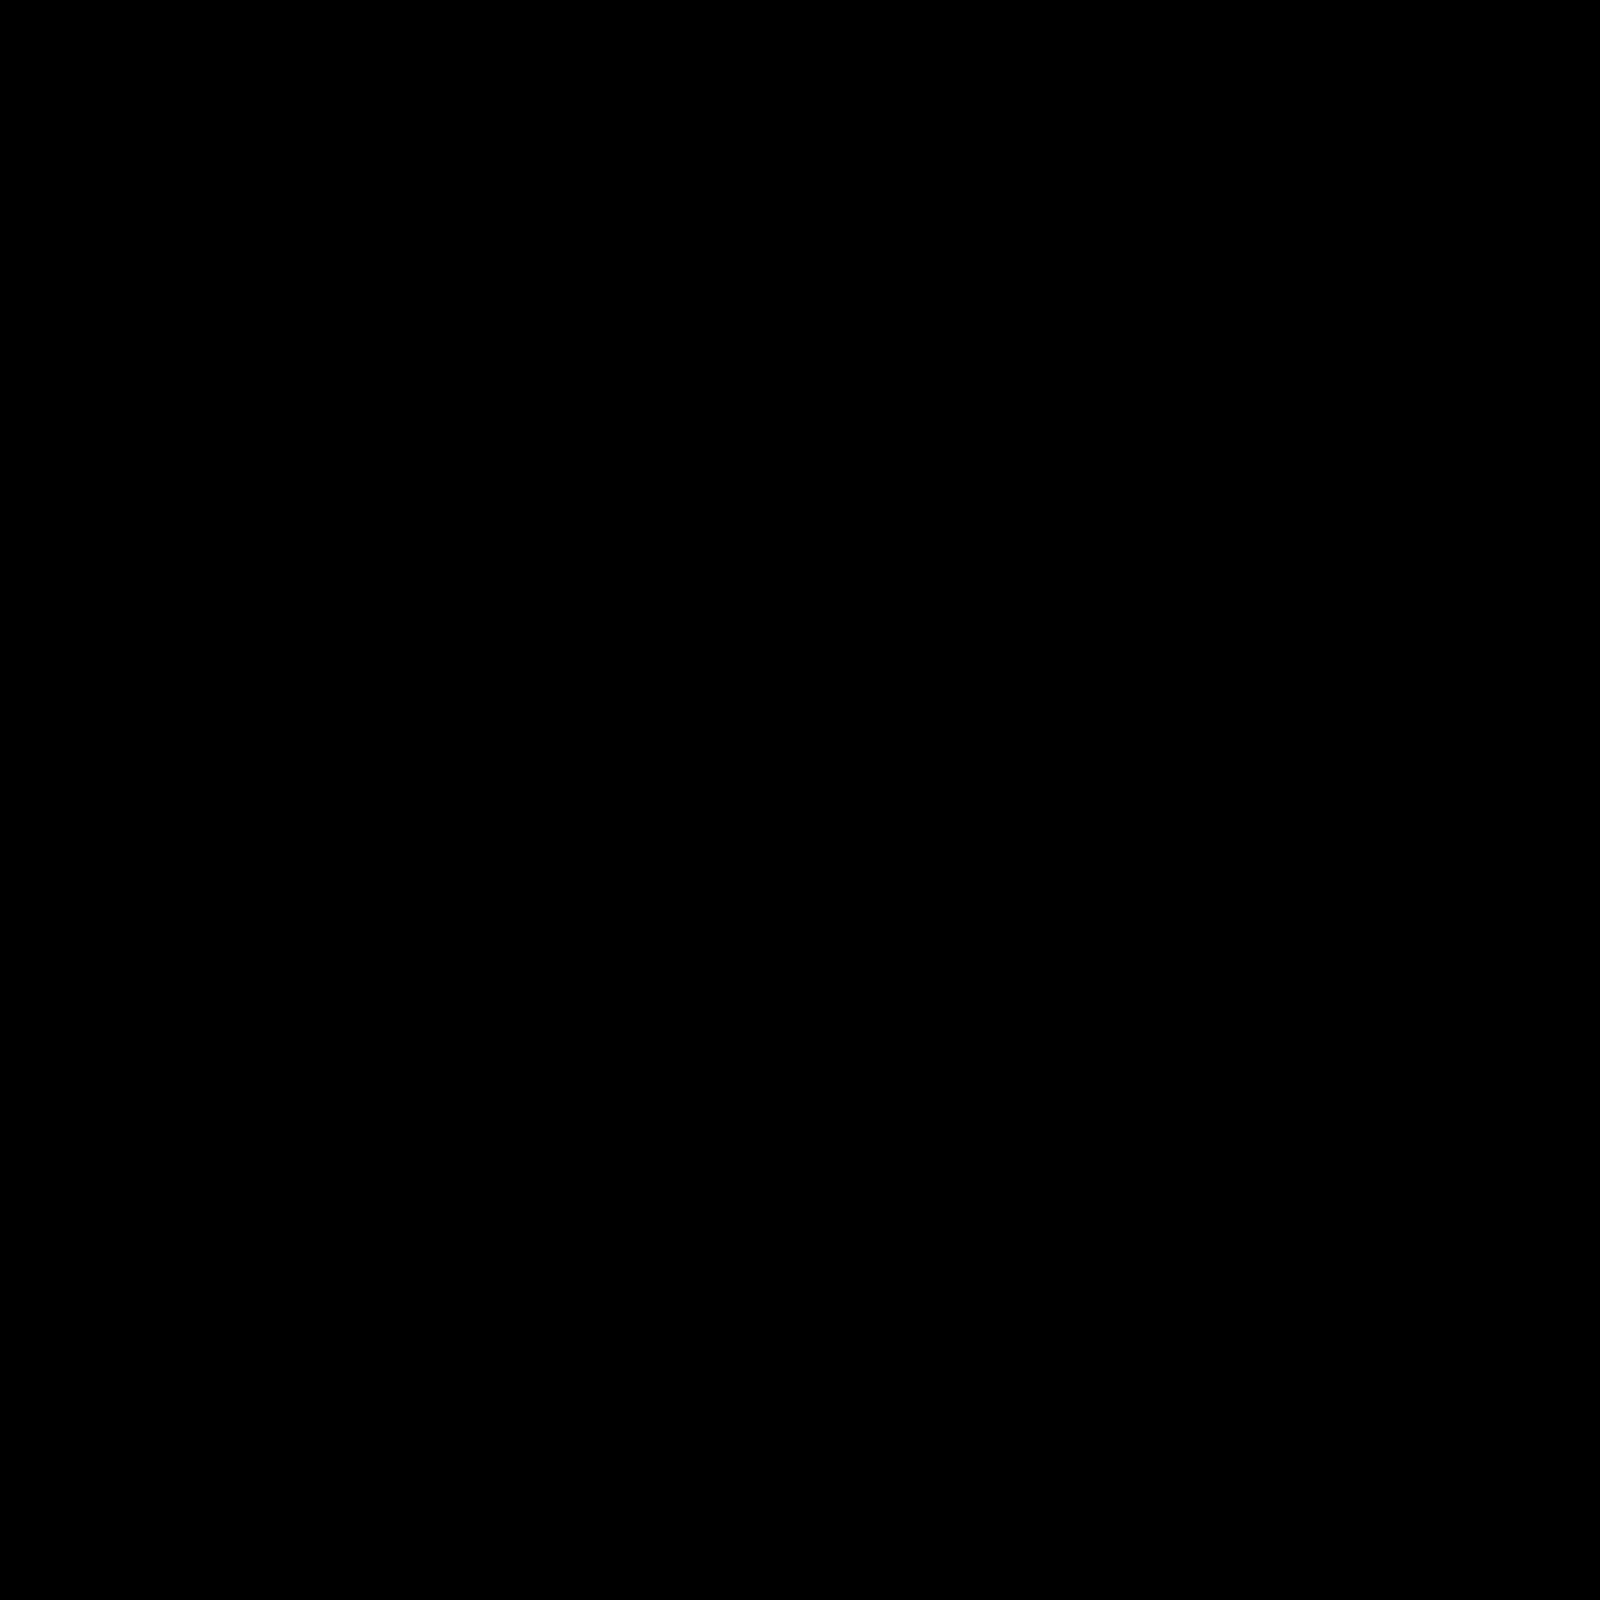 Vagón de ferrocarril con madera icon